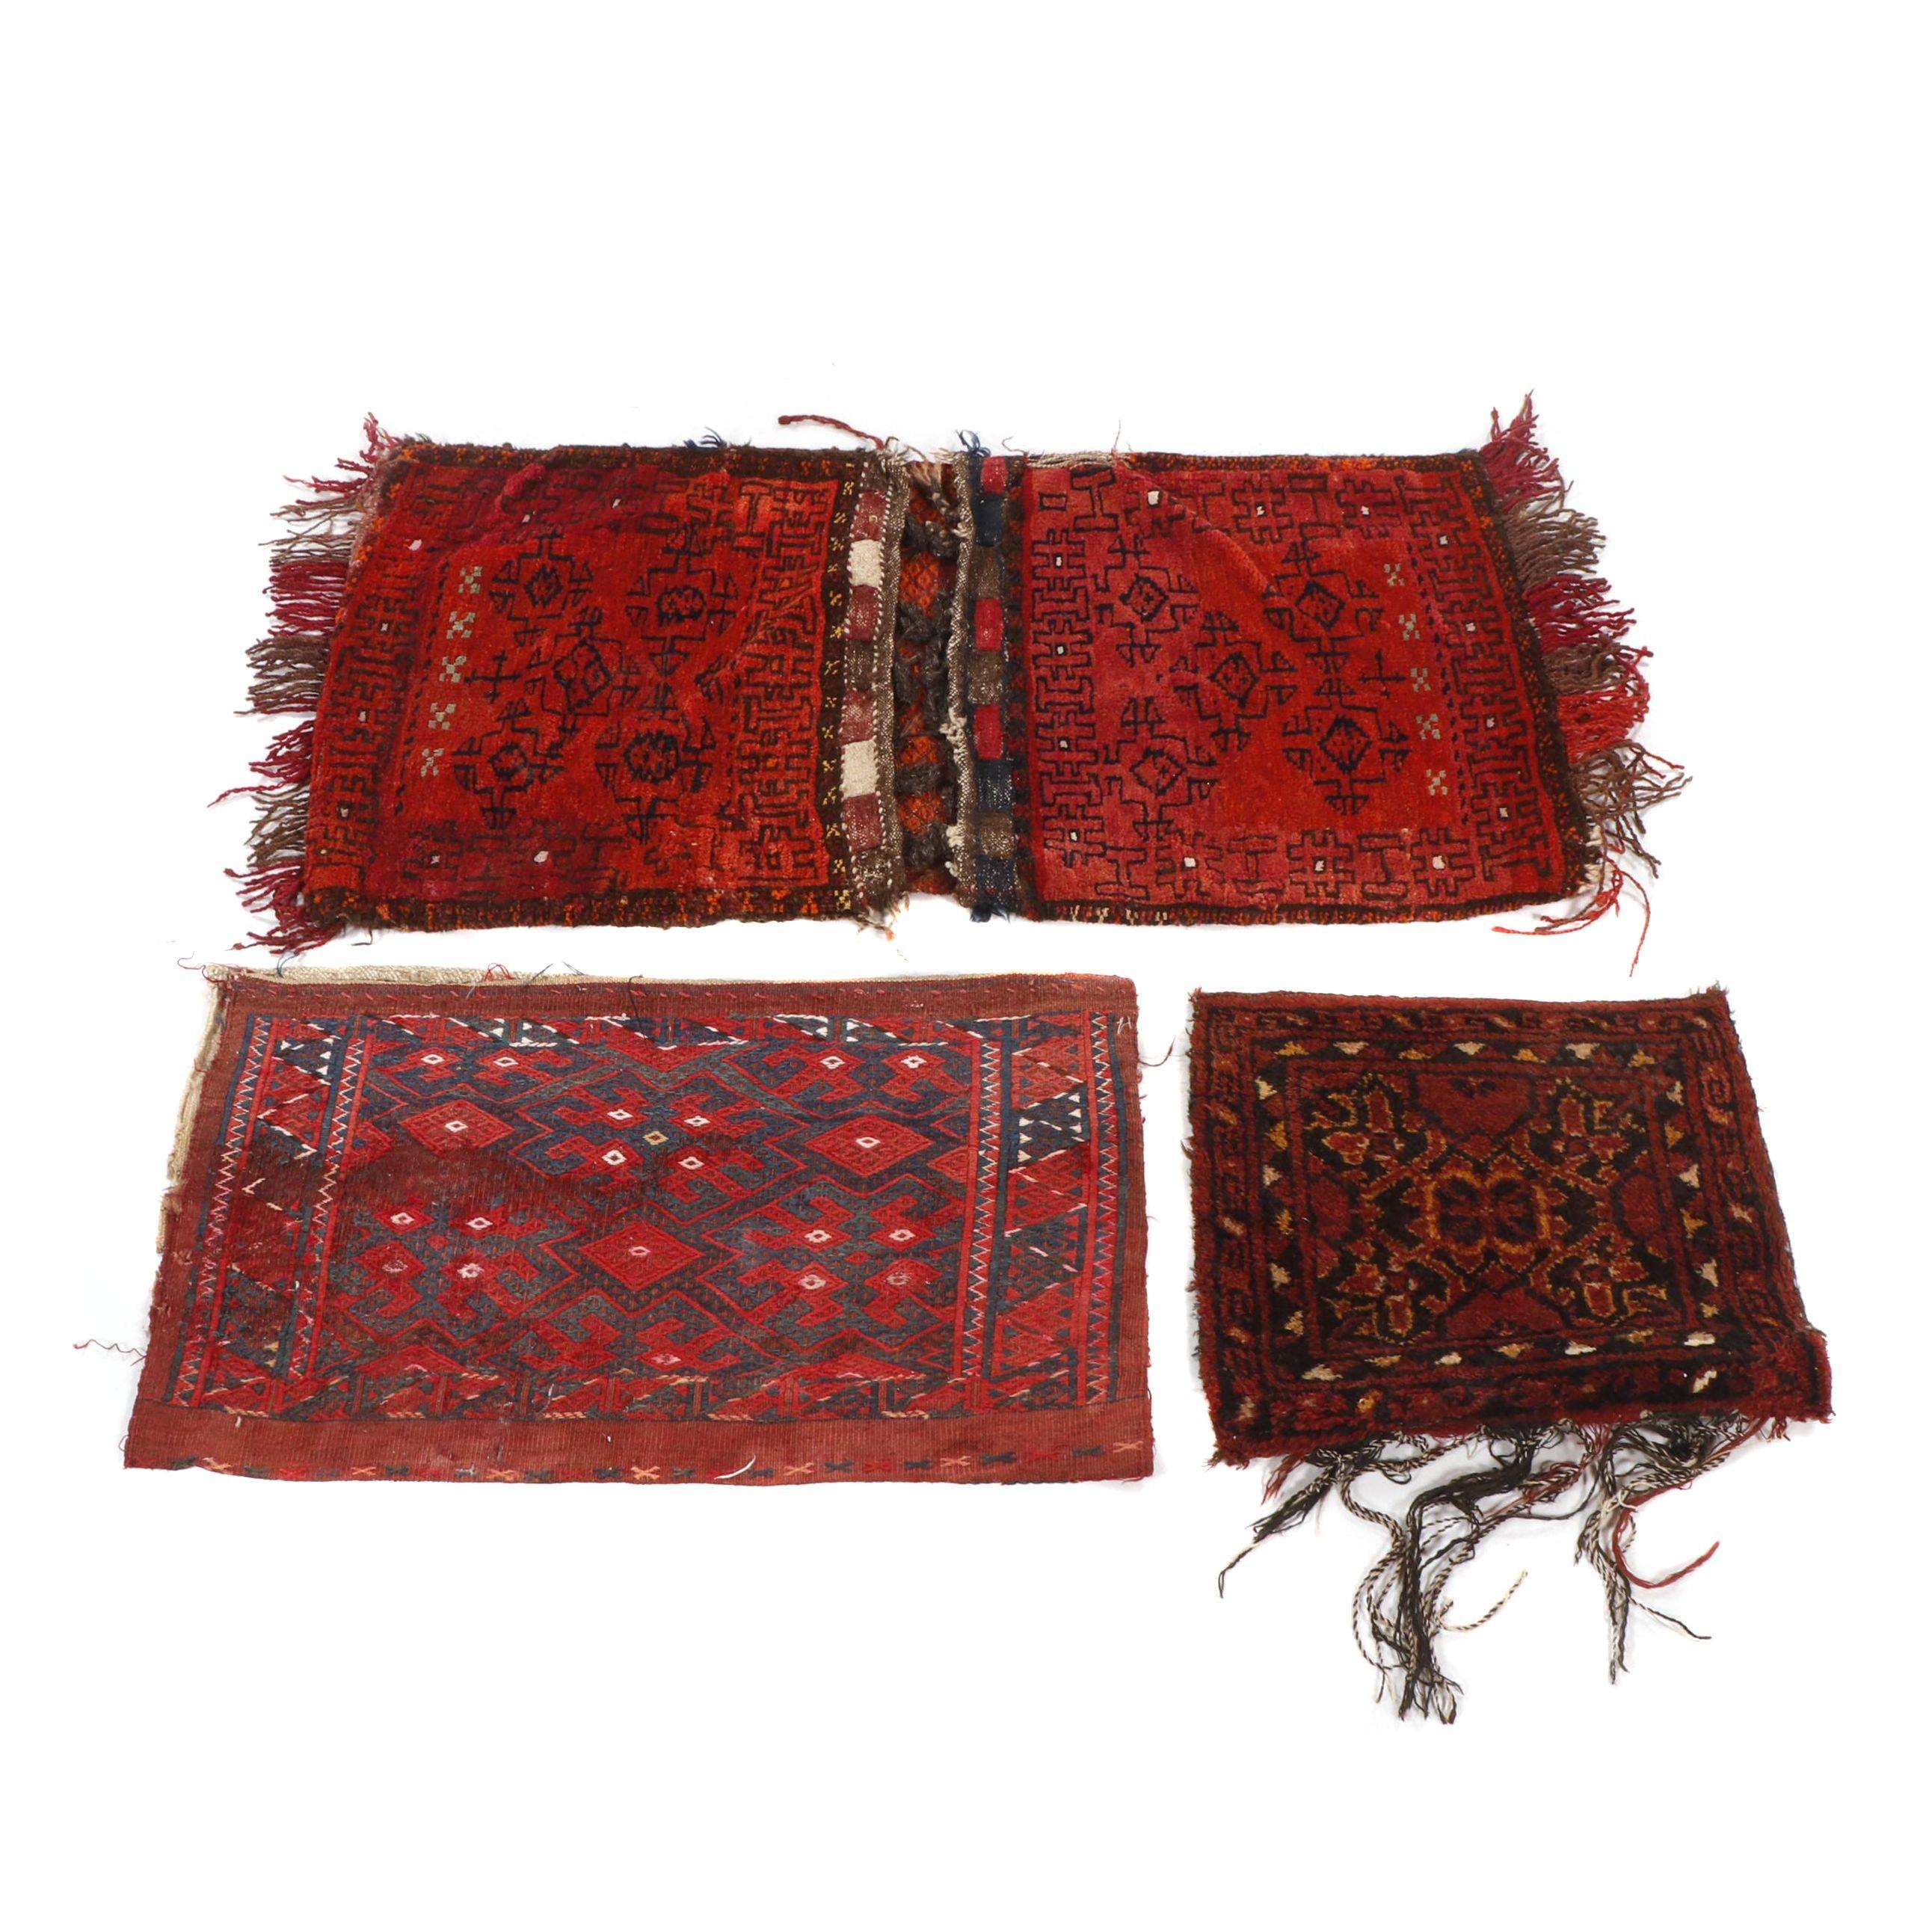 Hand-Knotted Khorjin and Suzani Wool Saddle Bags and Bag Facings